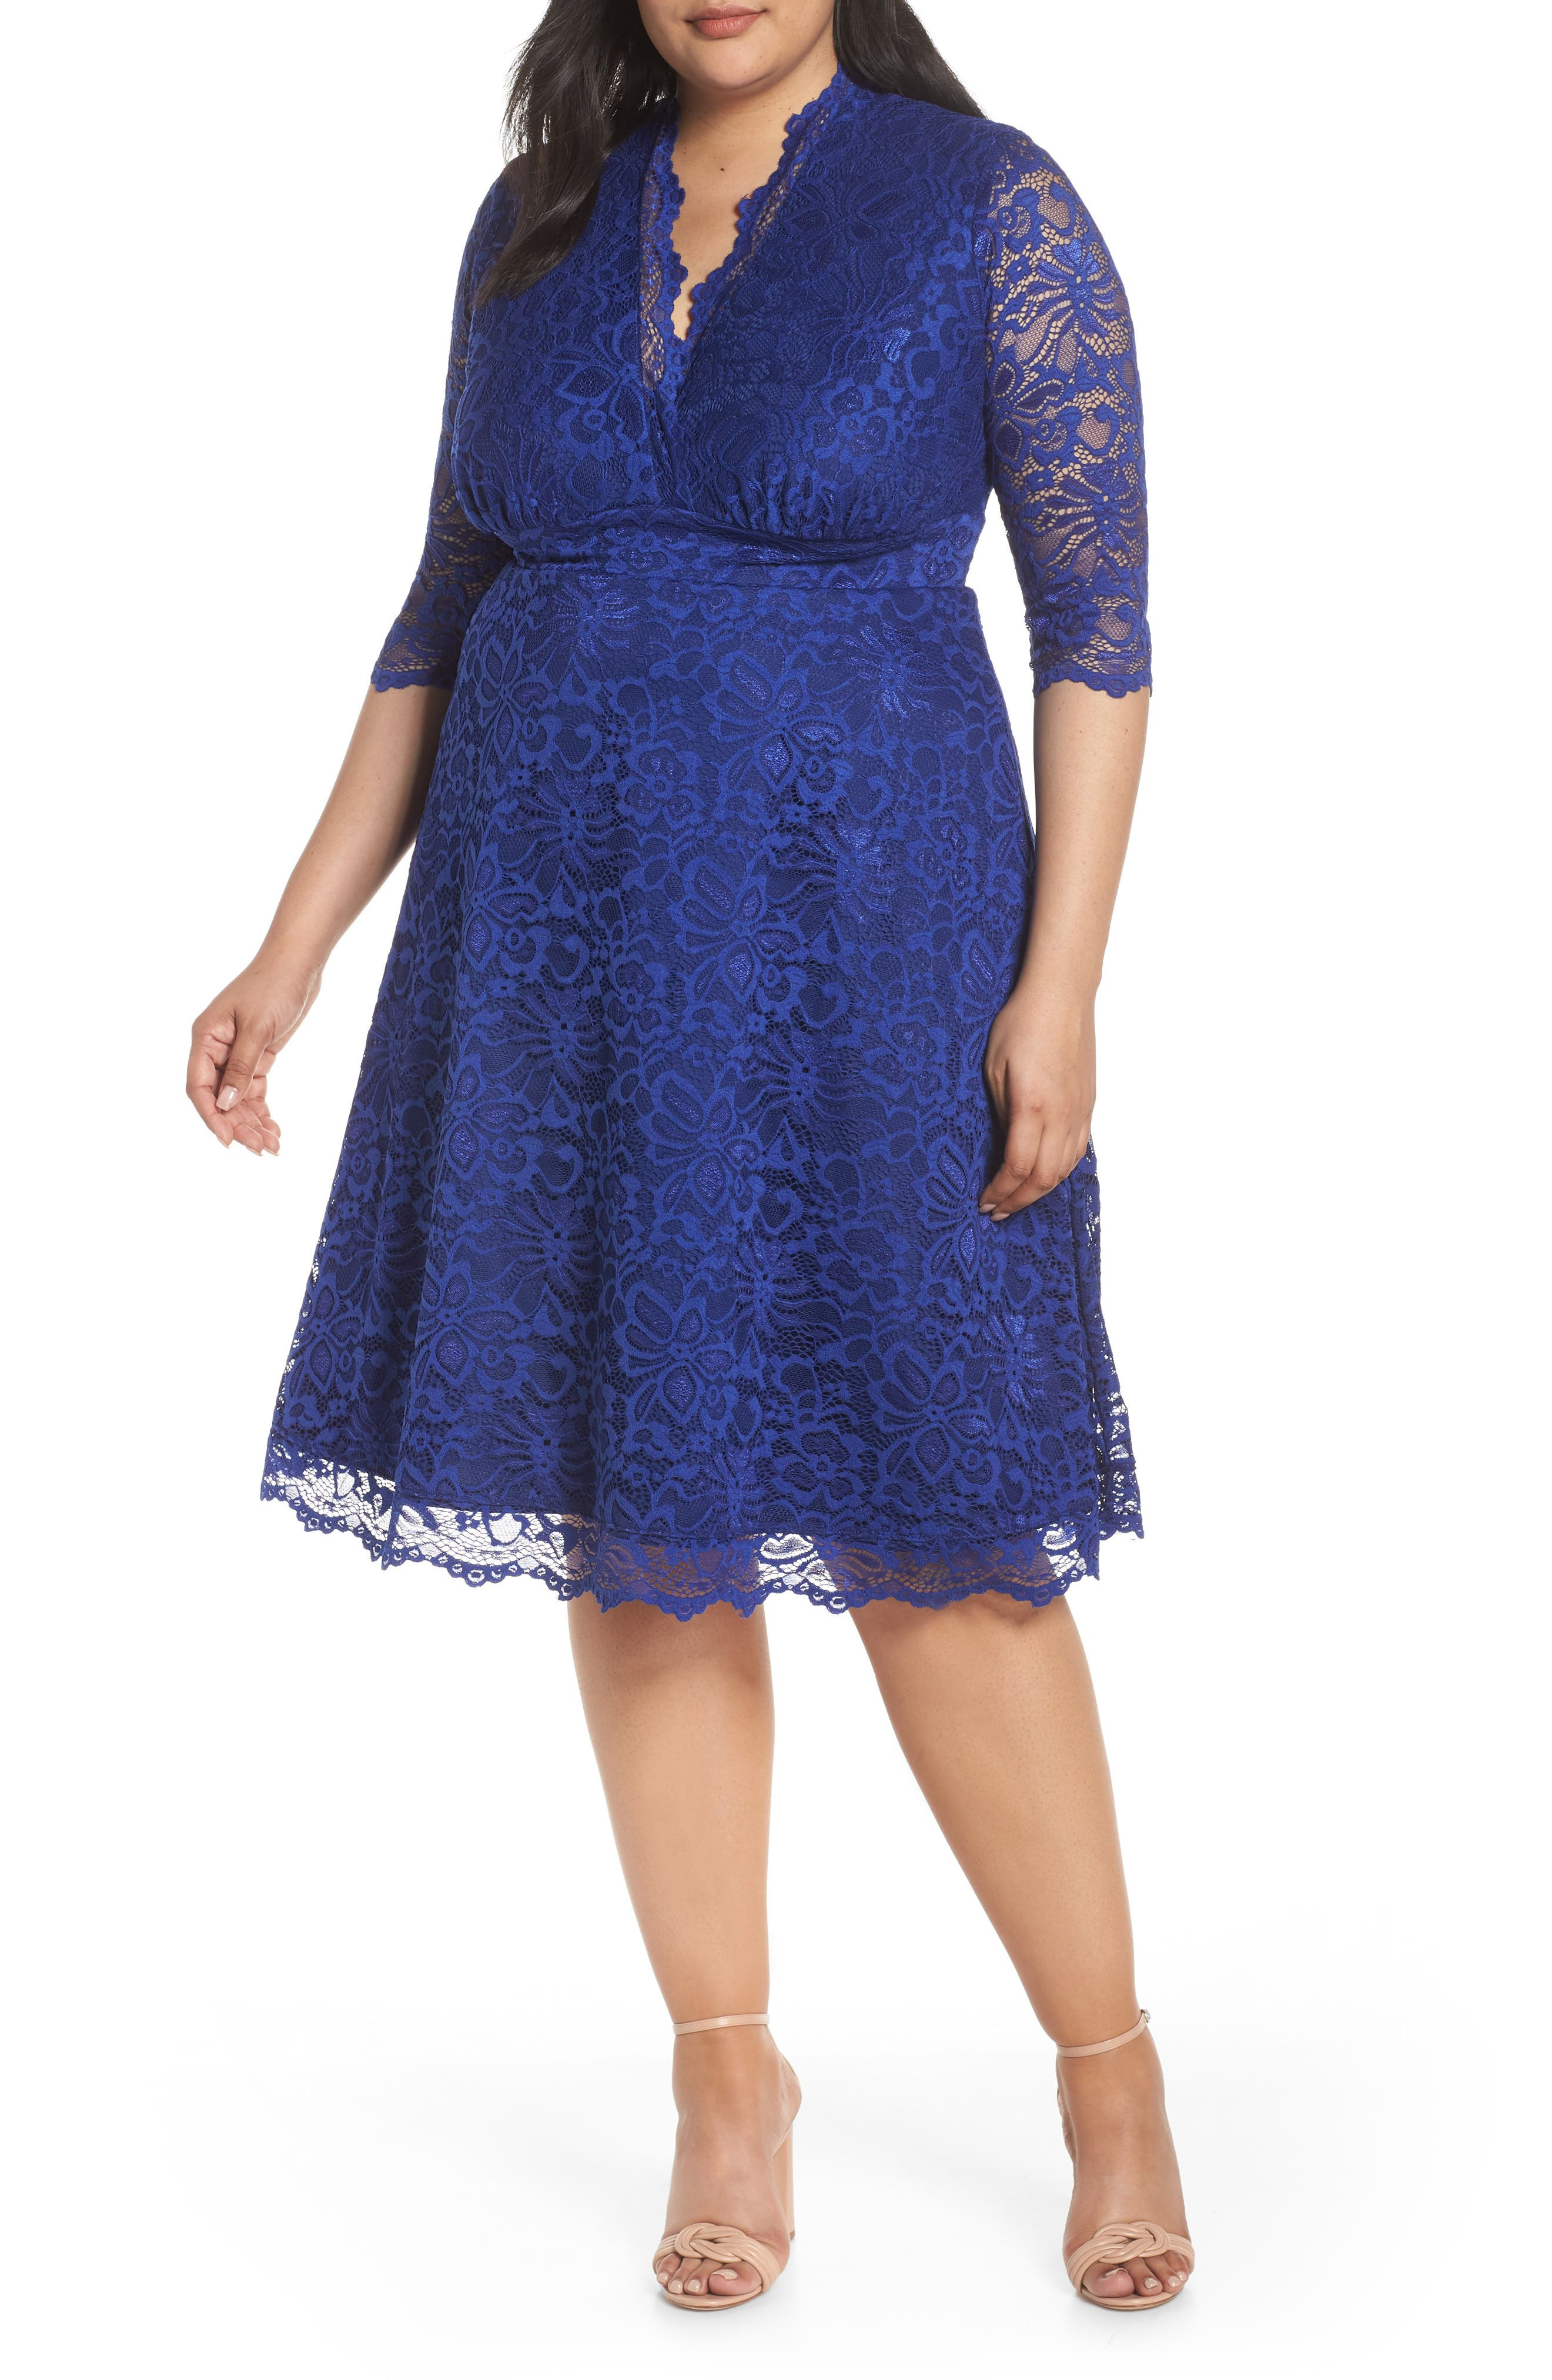 Mademoiselle Lace A-Line Dress